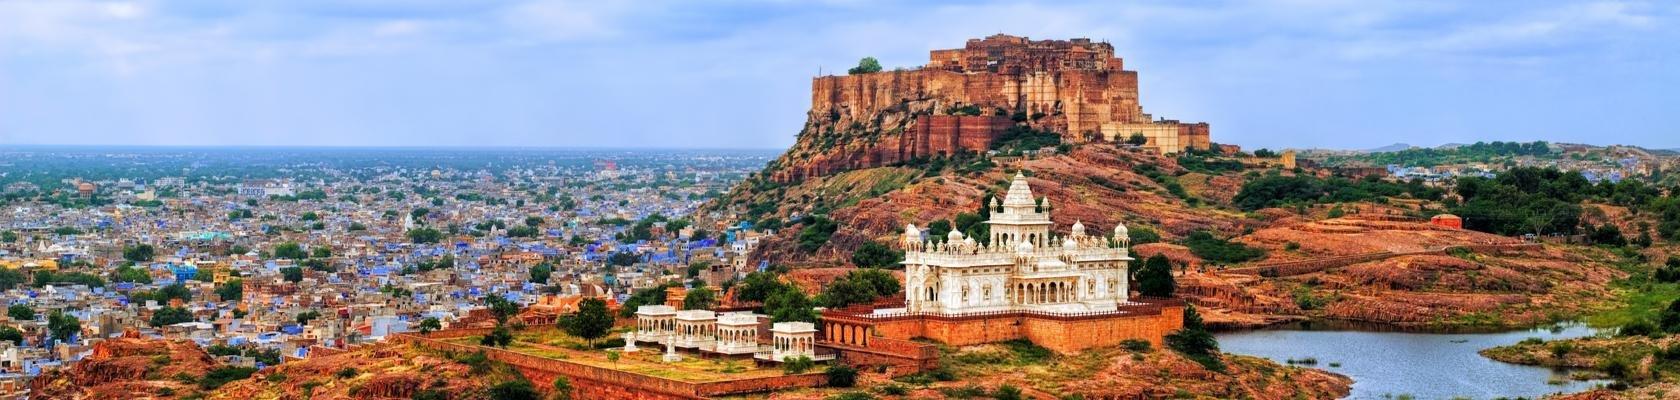 De blauwe stad Jodhpur